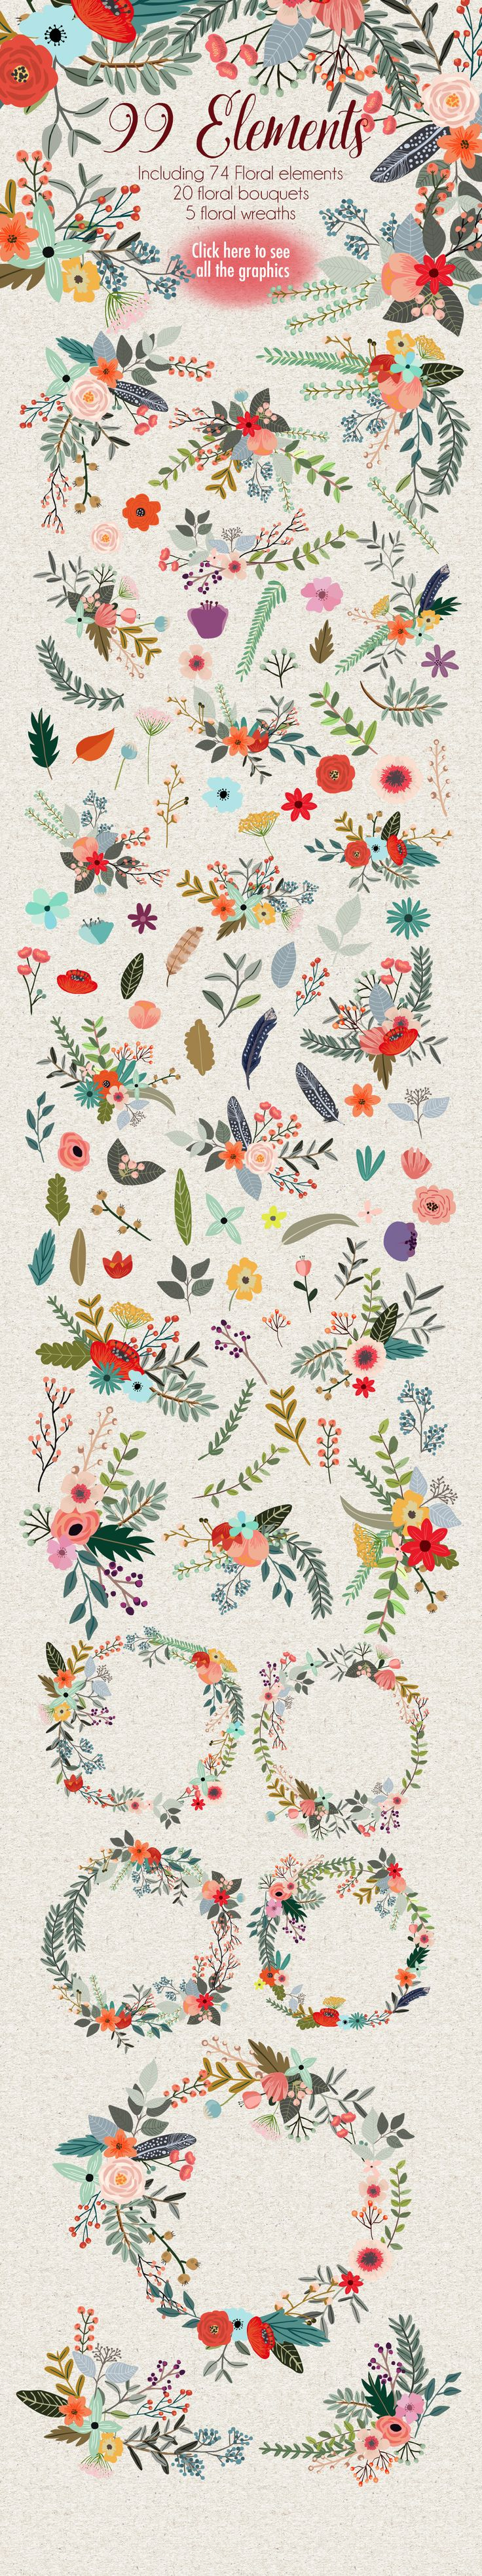 Cute flower clip art!